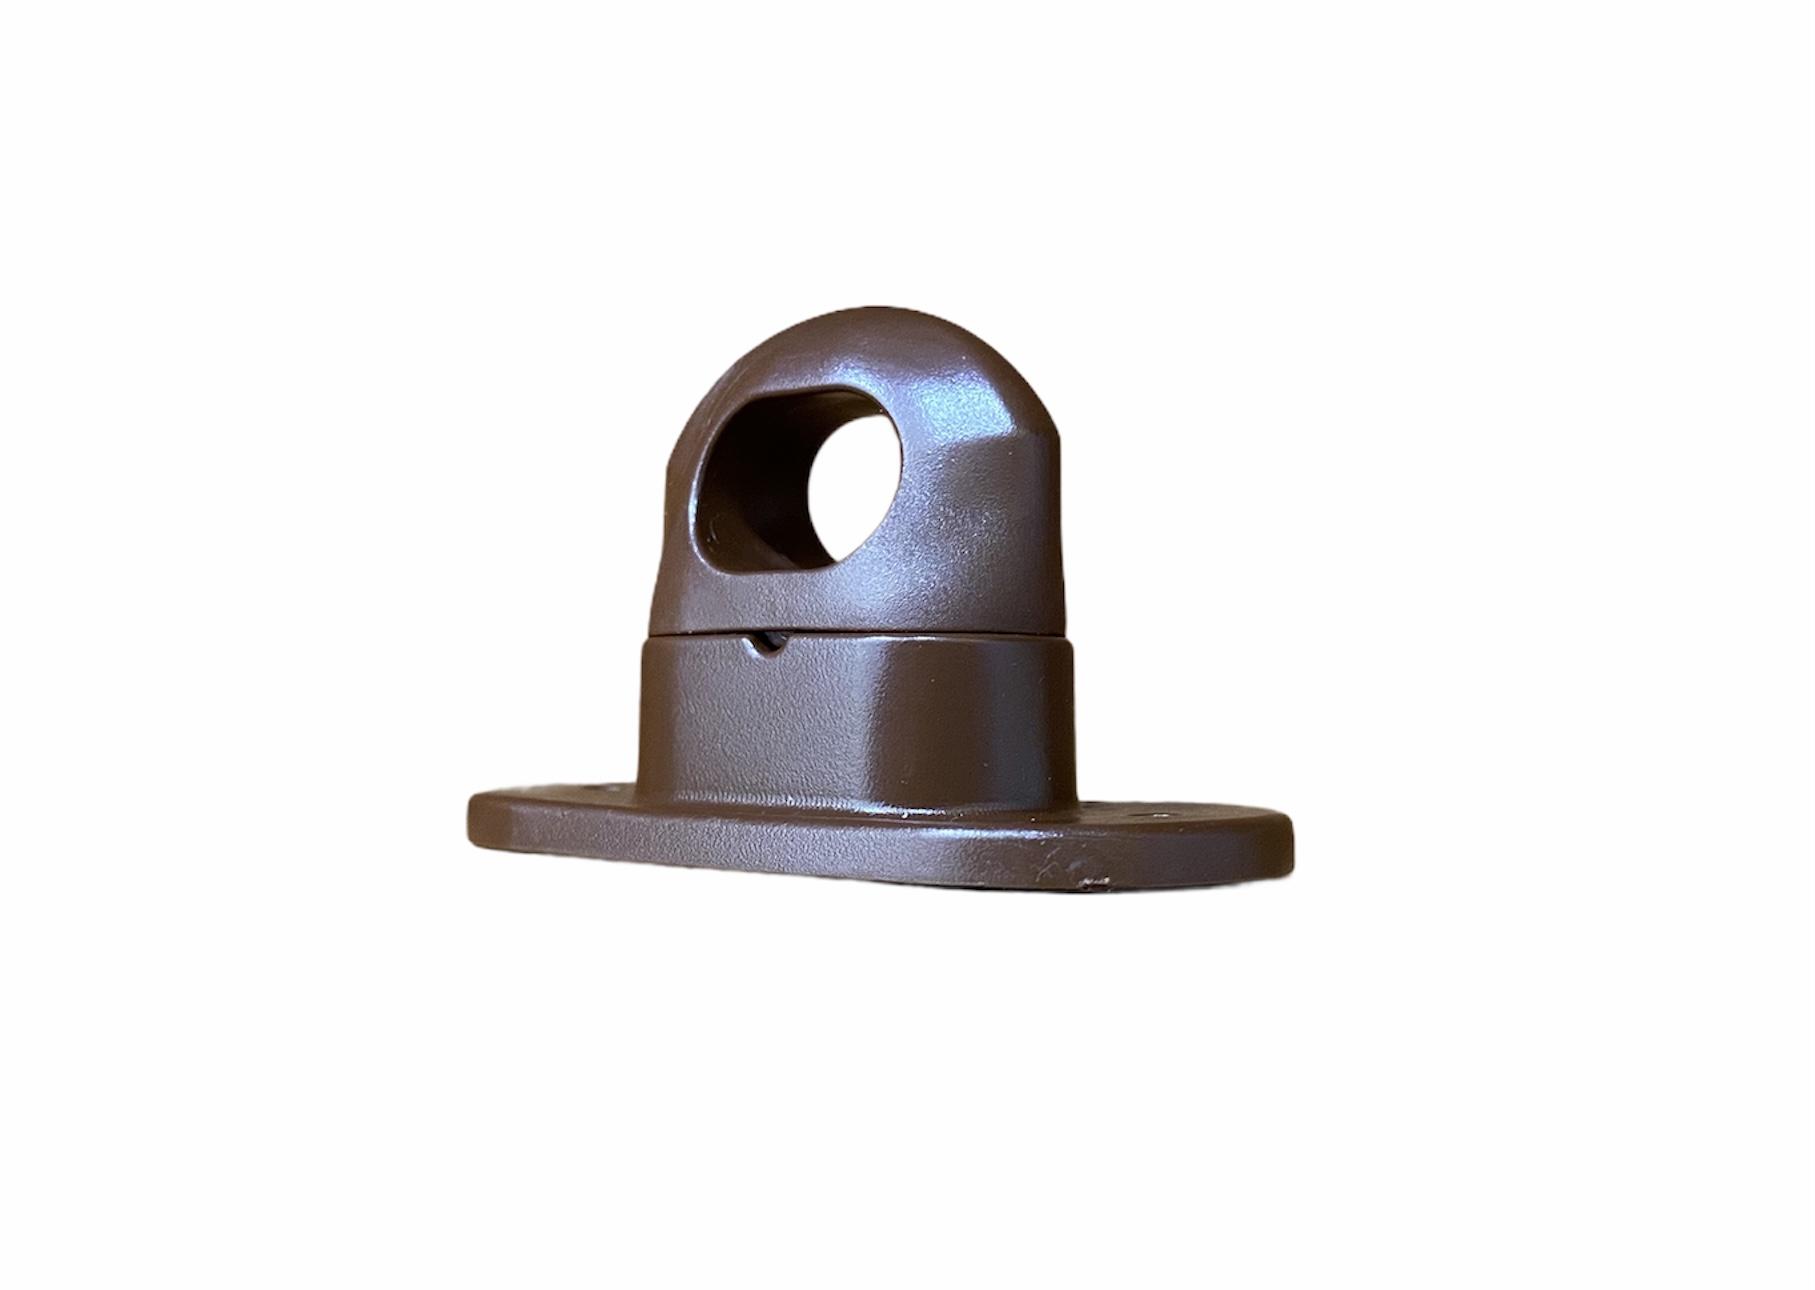 Скоба поворотная коричневая пластик H-17mm., h-25mm. (100шт.)